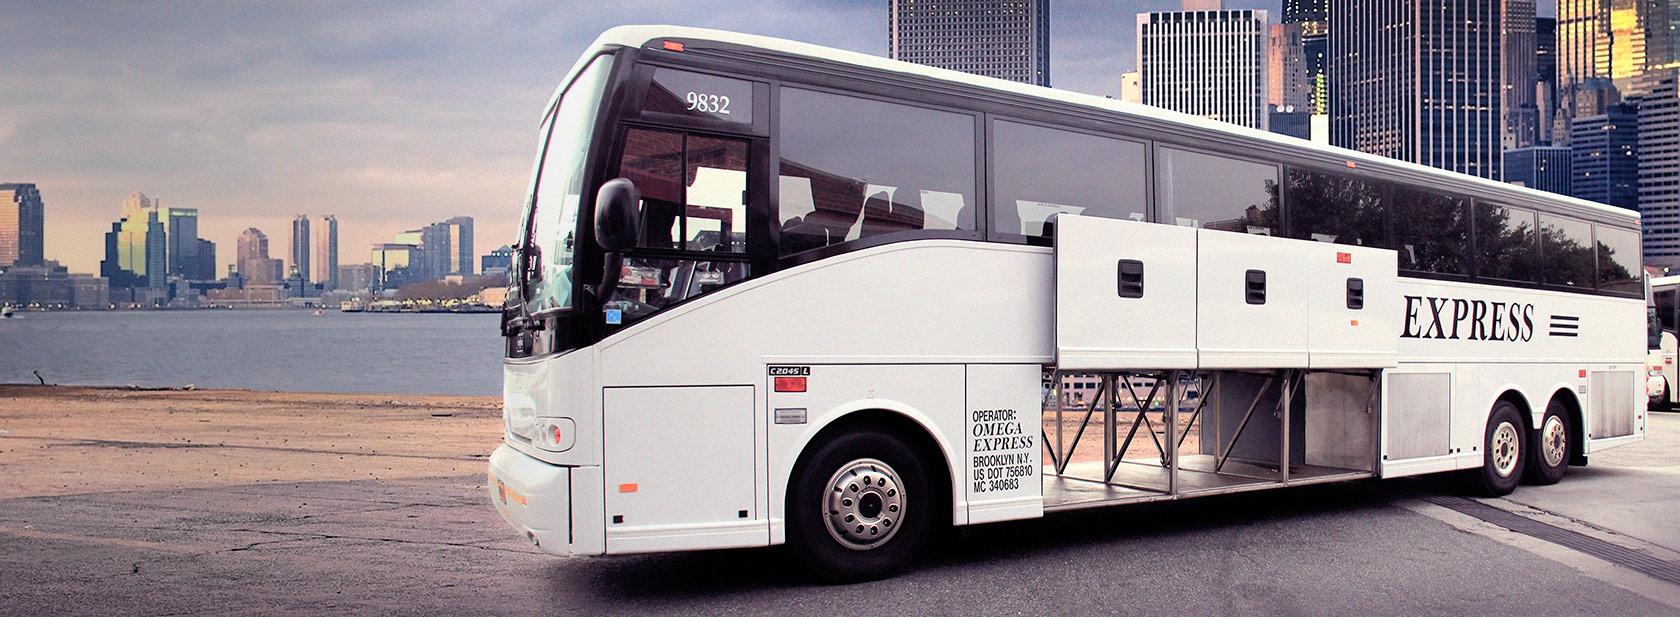 Charter Bus Rental New York, Bus Charter NJ, Brooklyn, Bronx